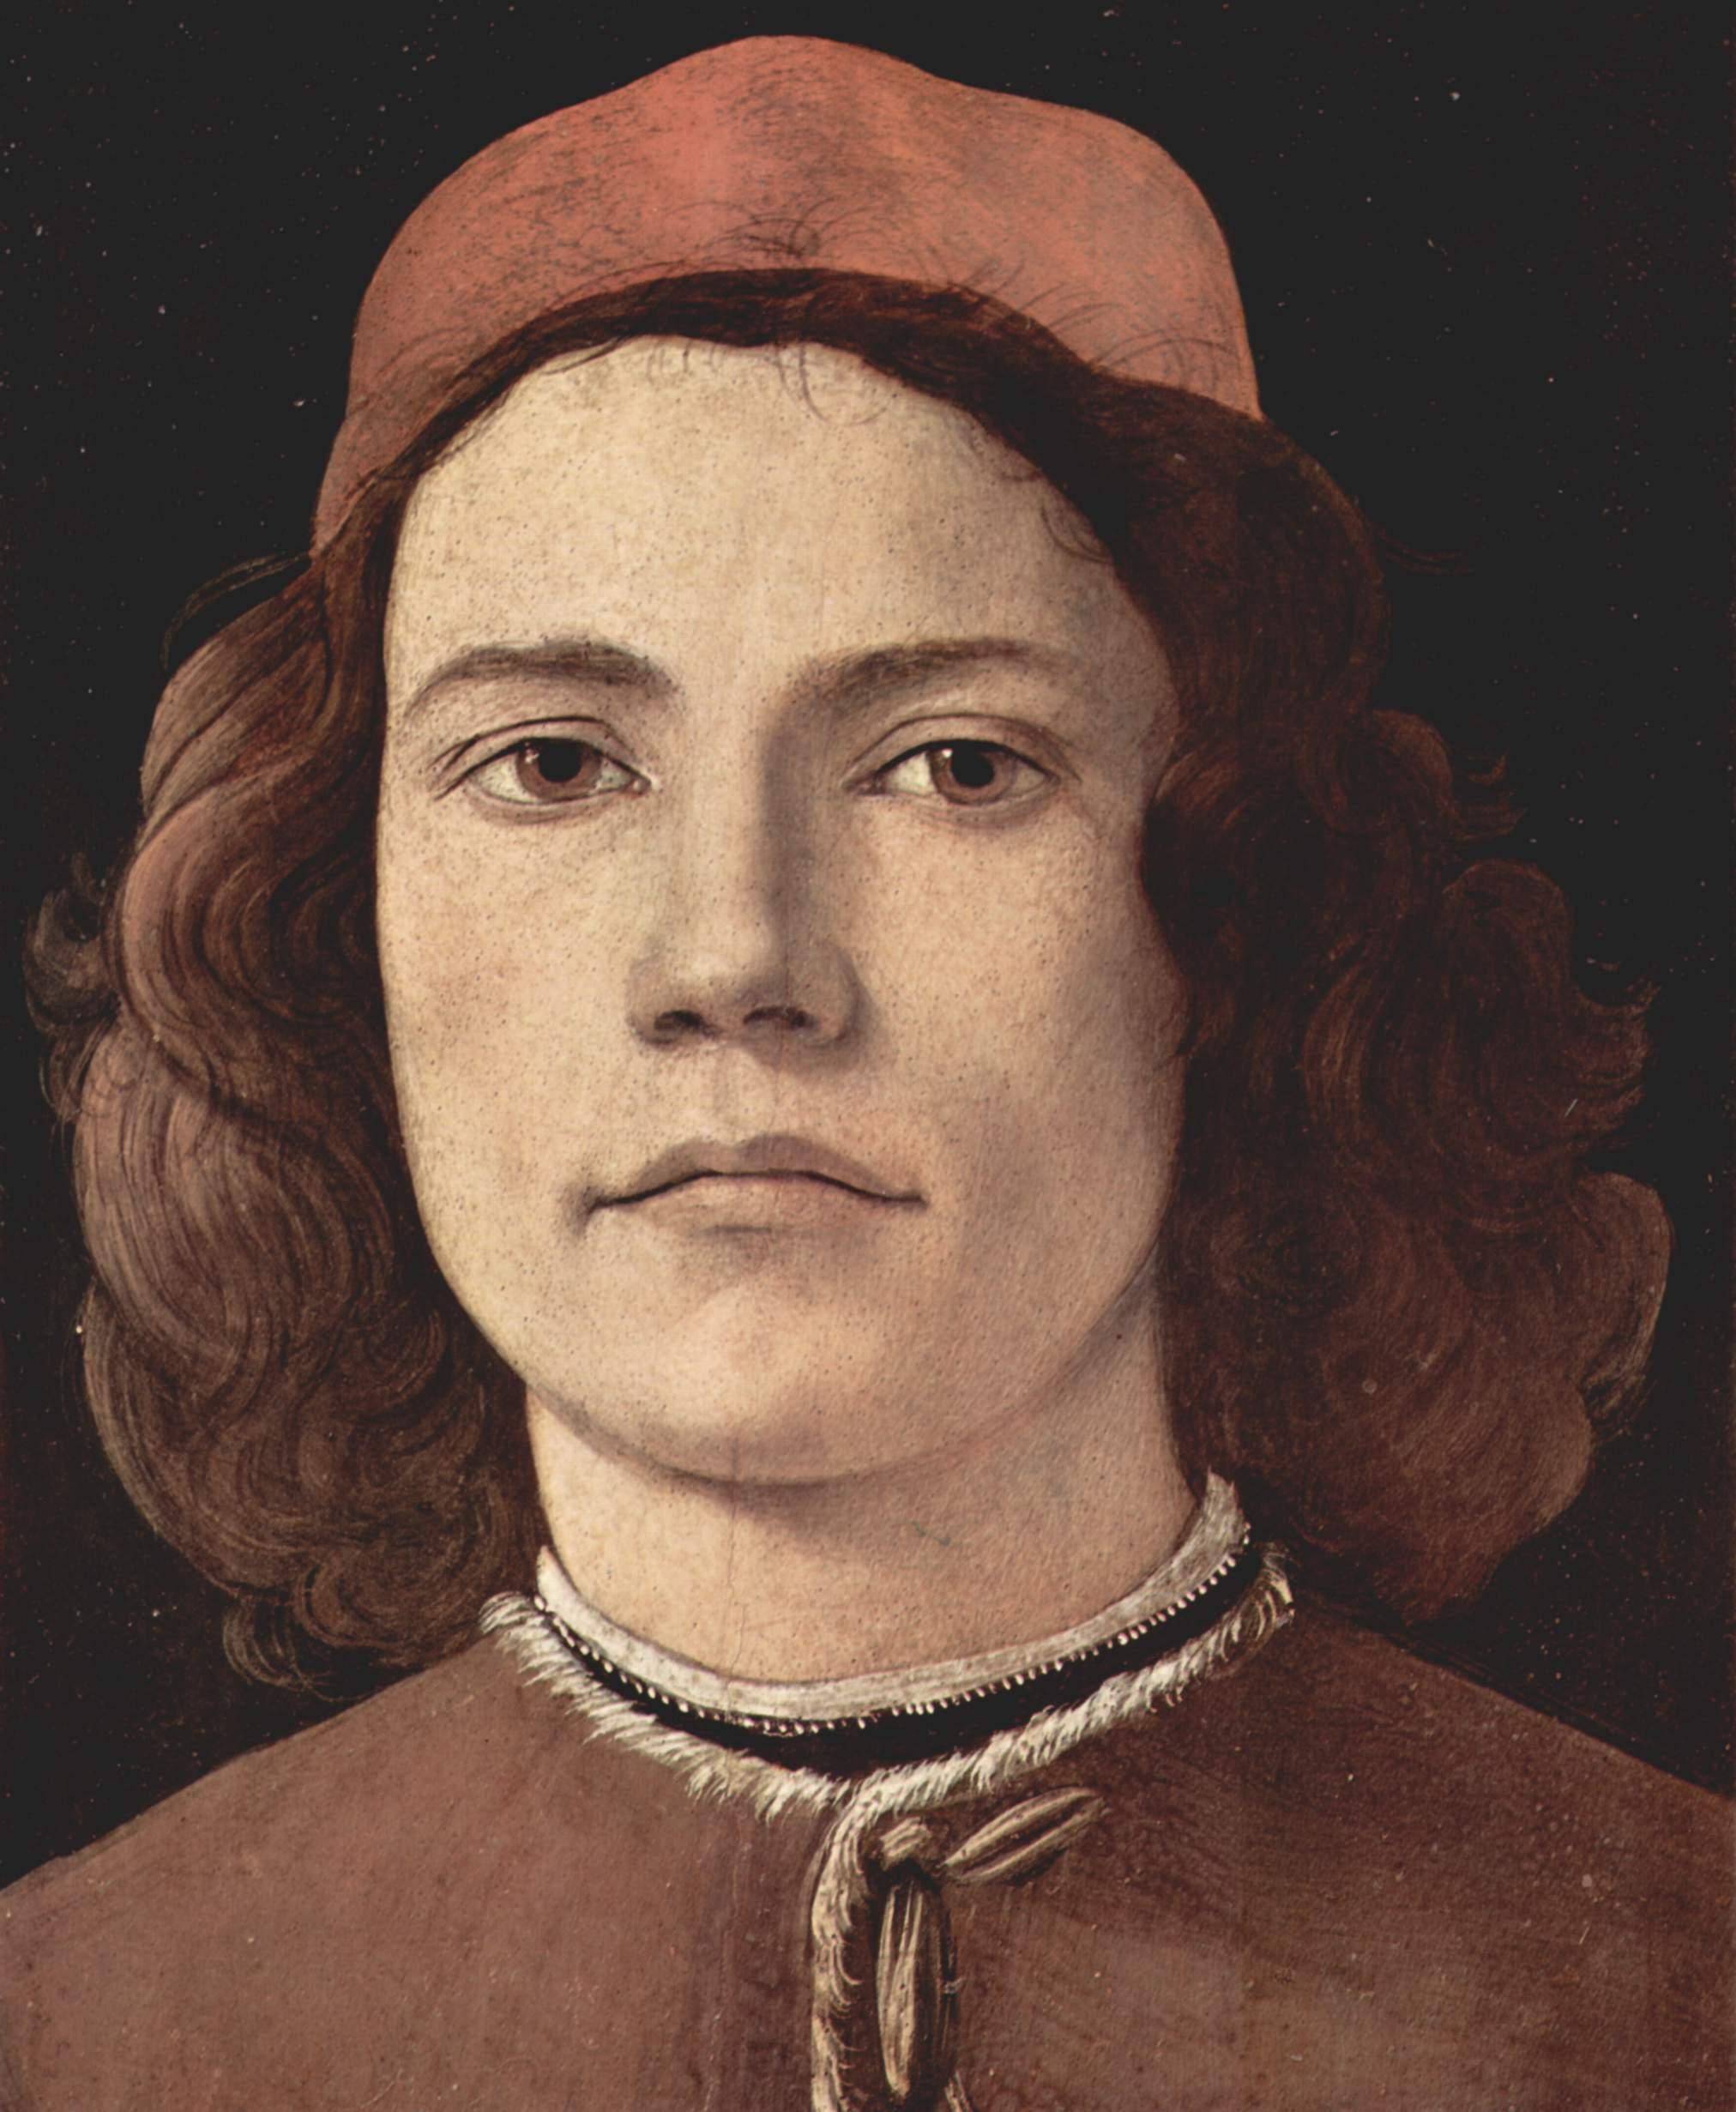 Sandro Botticelli - Retrato de un joven, detalle ...